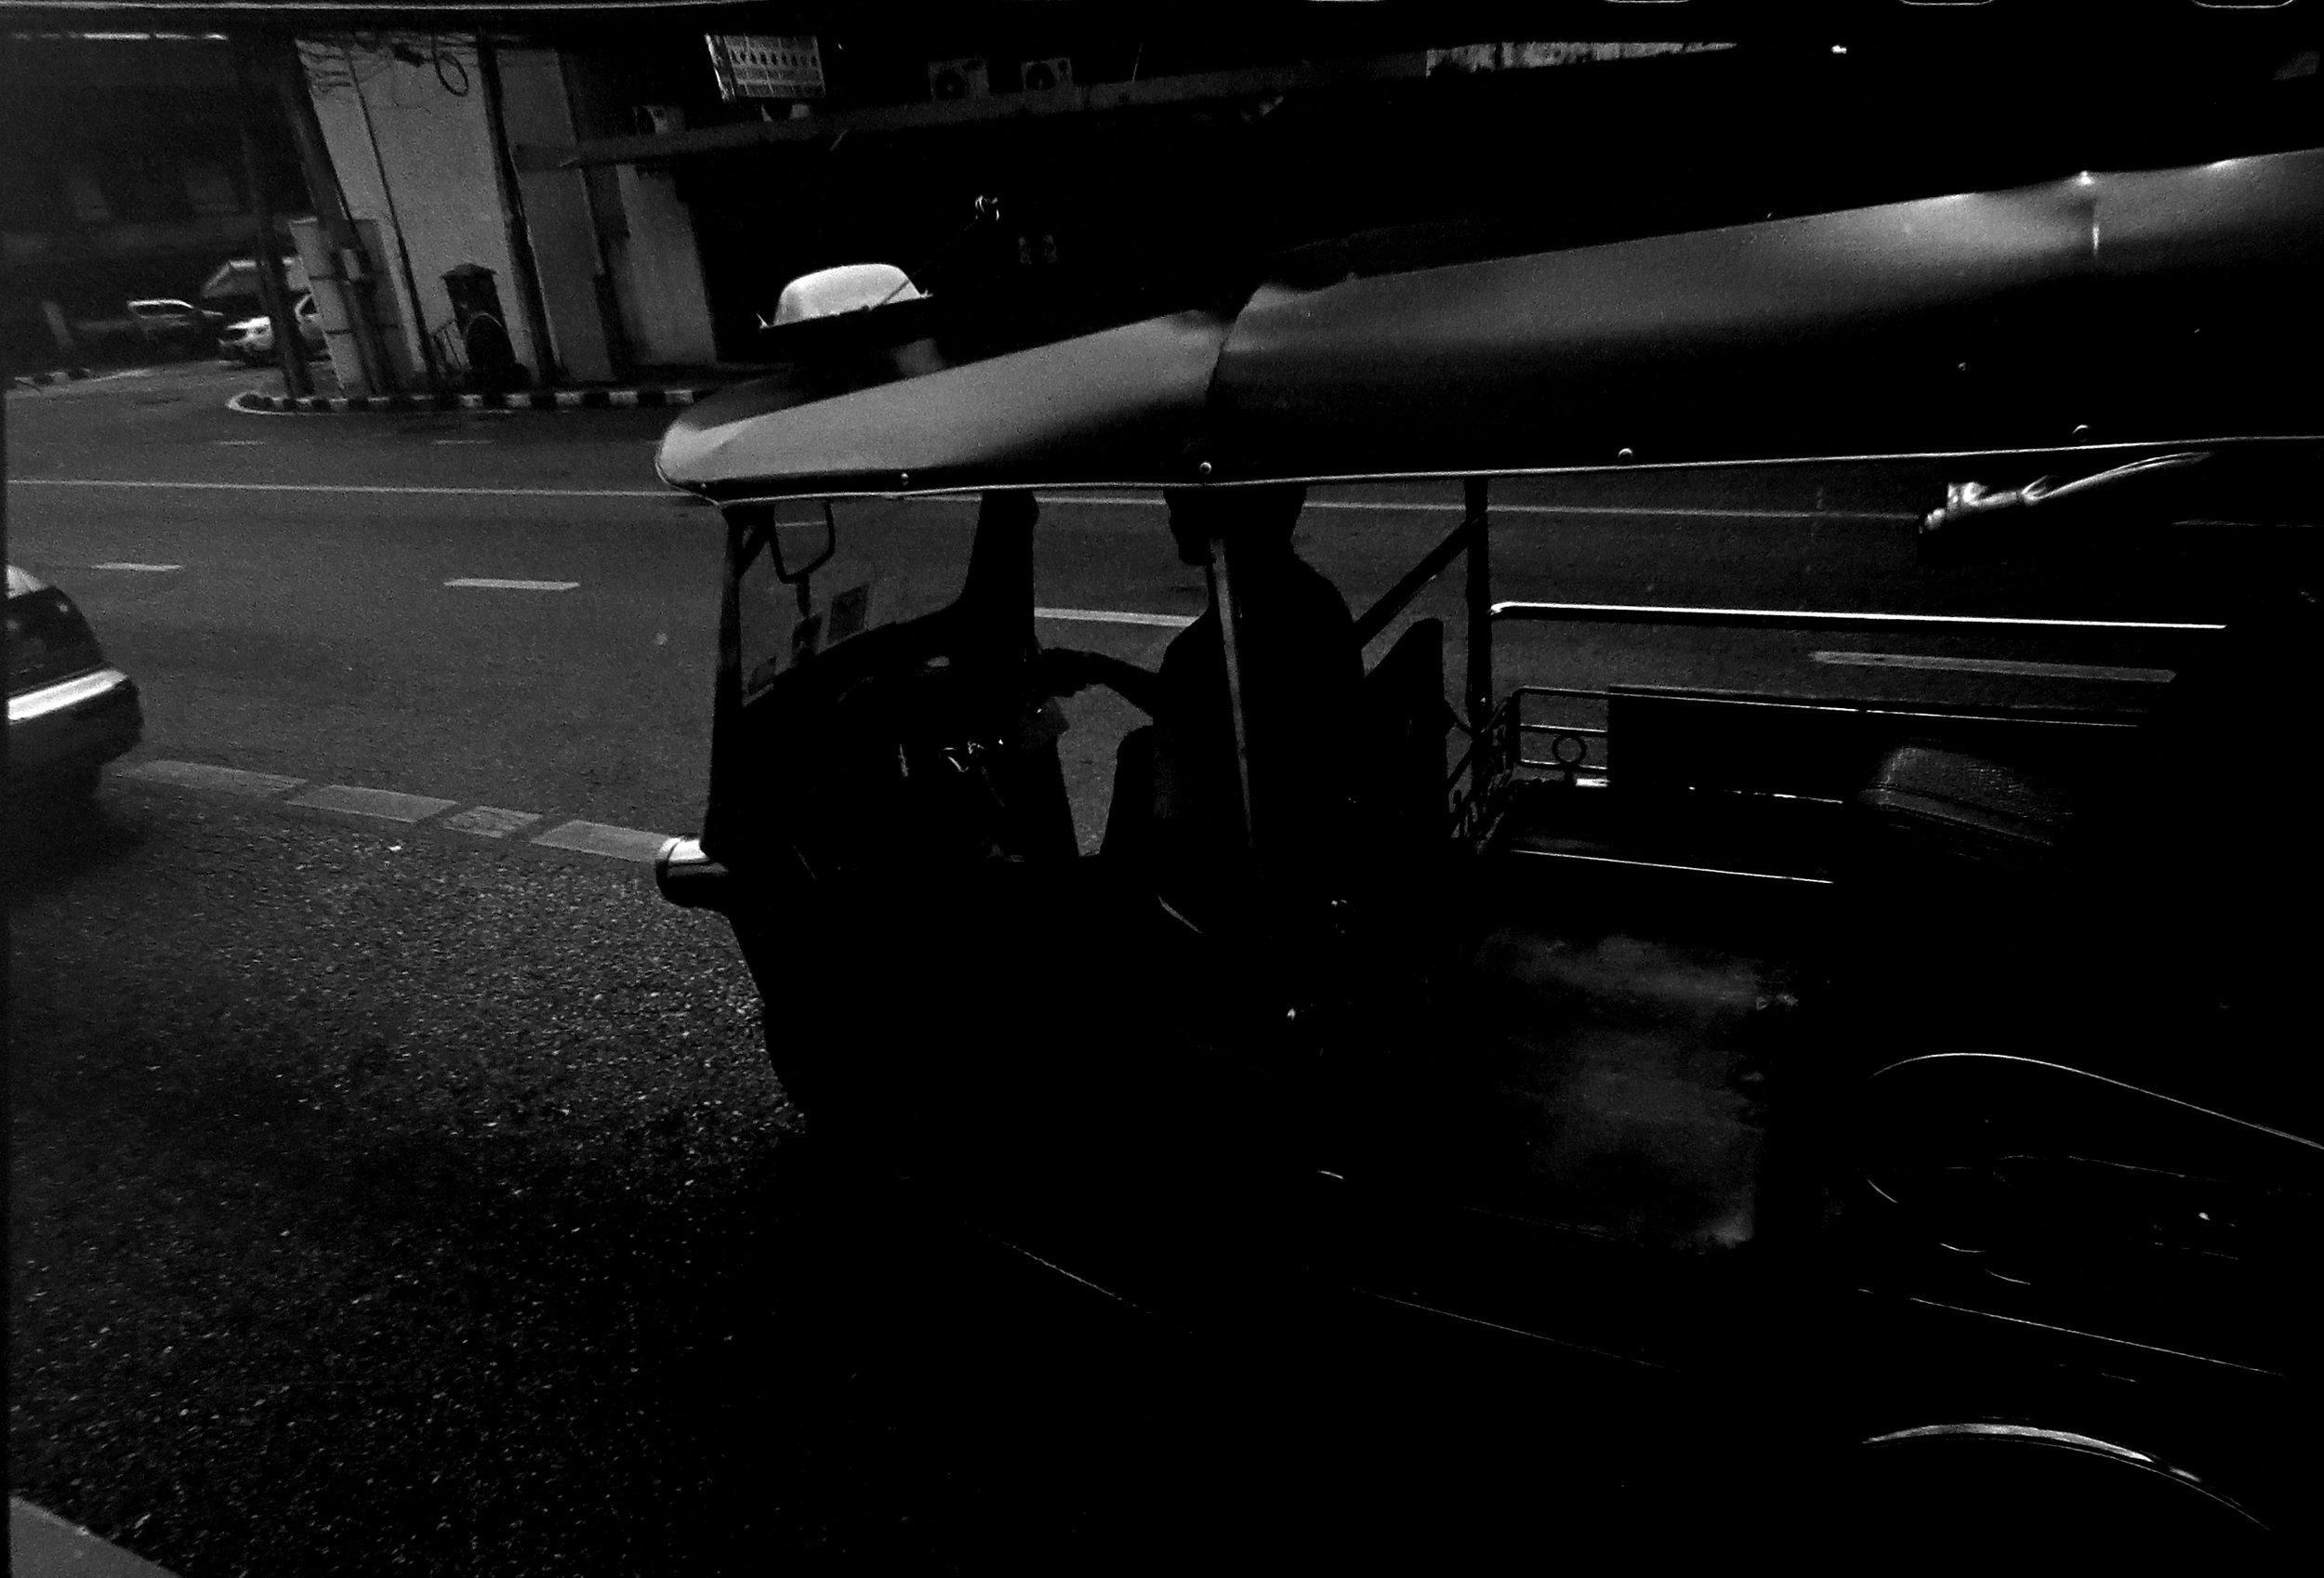 Chromacomaphoto street photography Bangkok Leica M3 super angulon 21mm 3 4 tri x Thailand film (5).JPG